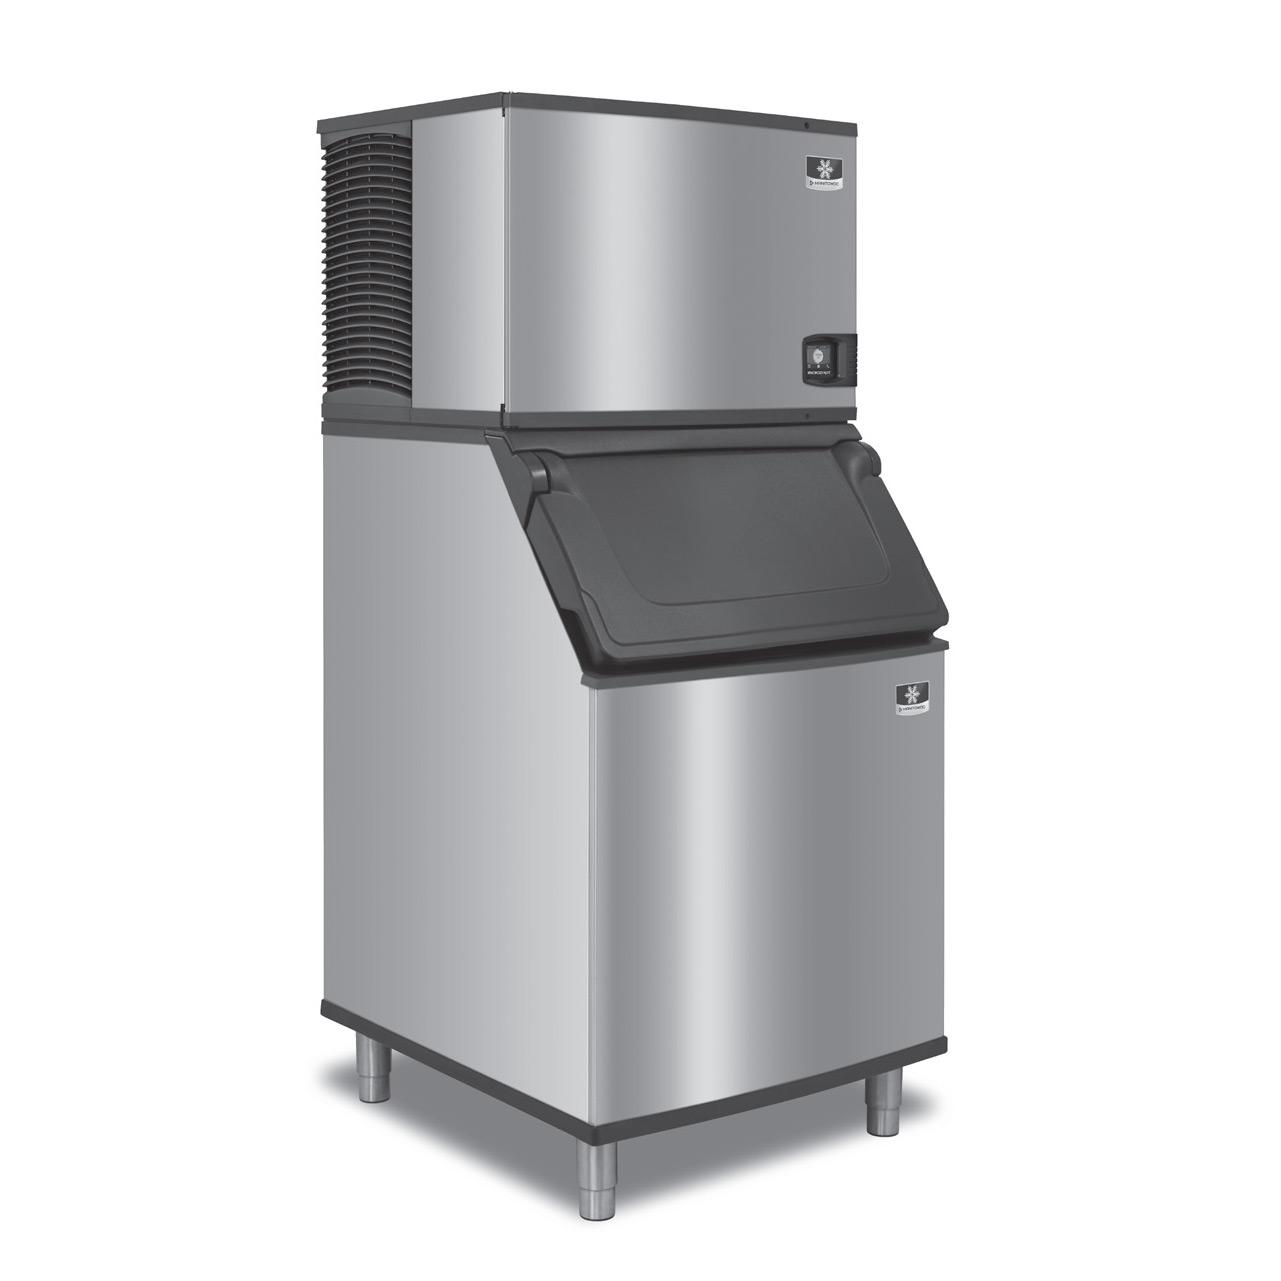 Manitowoc IDF0600N ice maker, cube-style